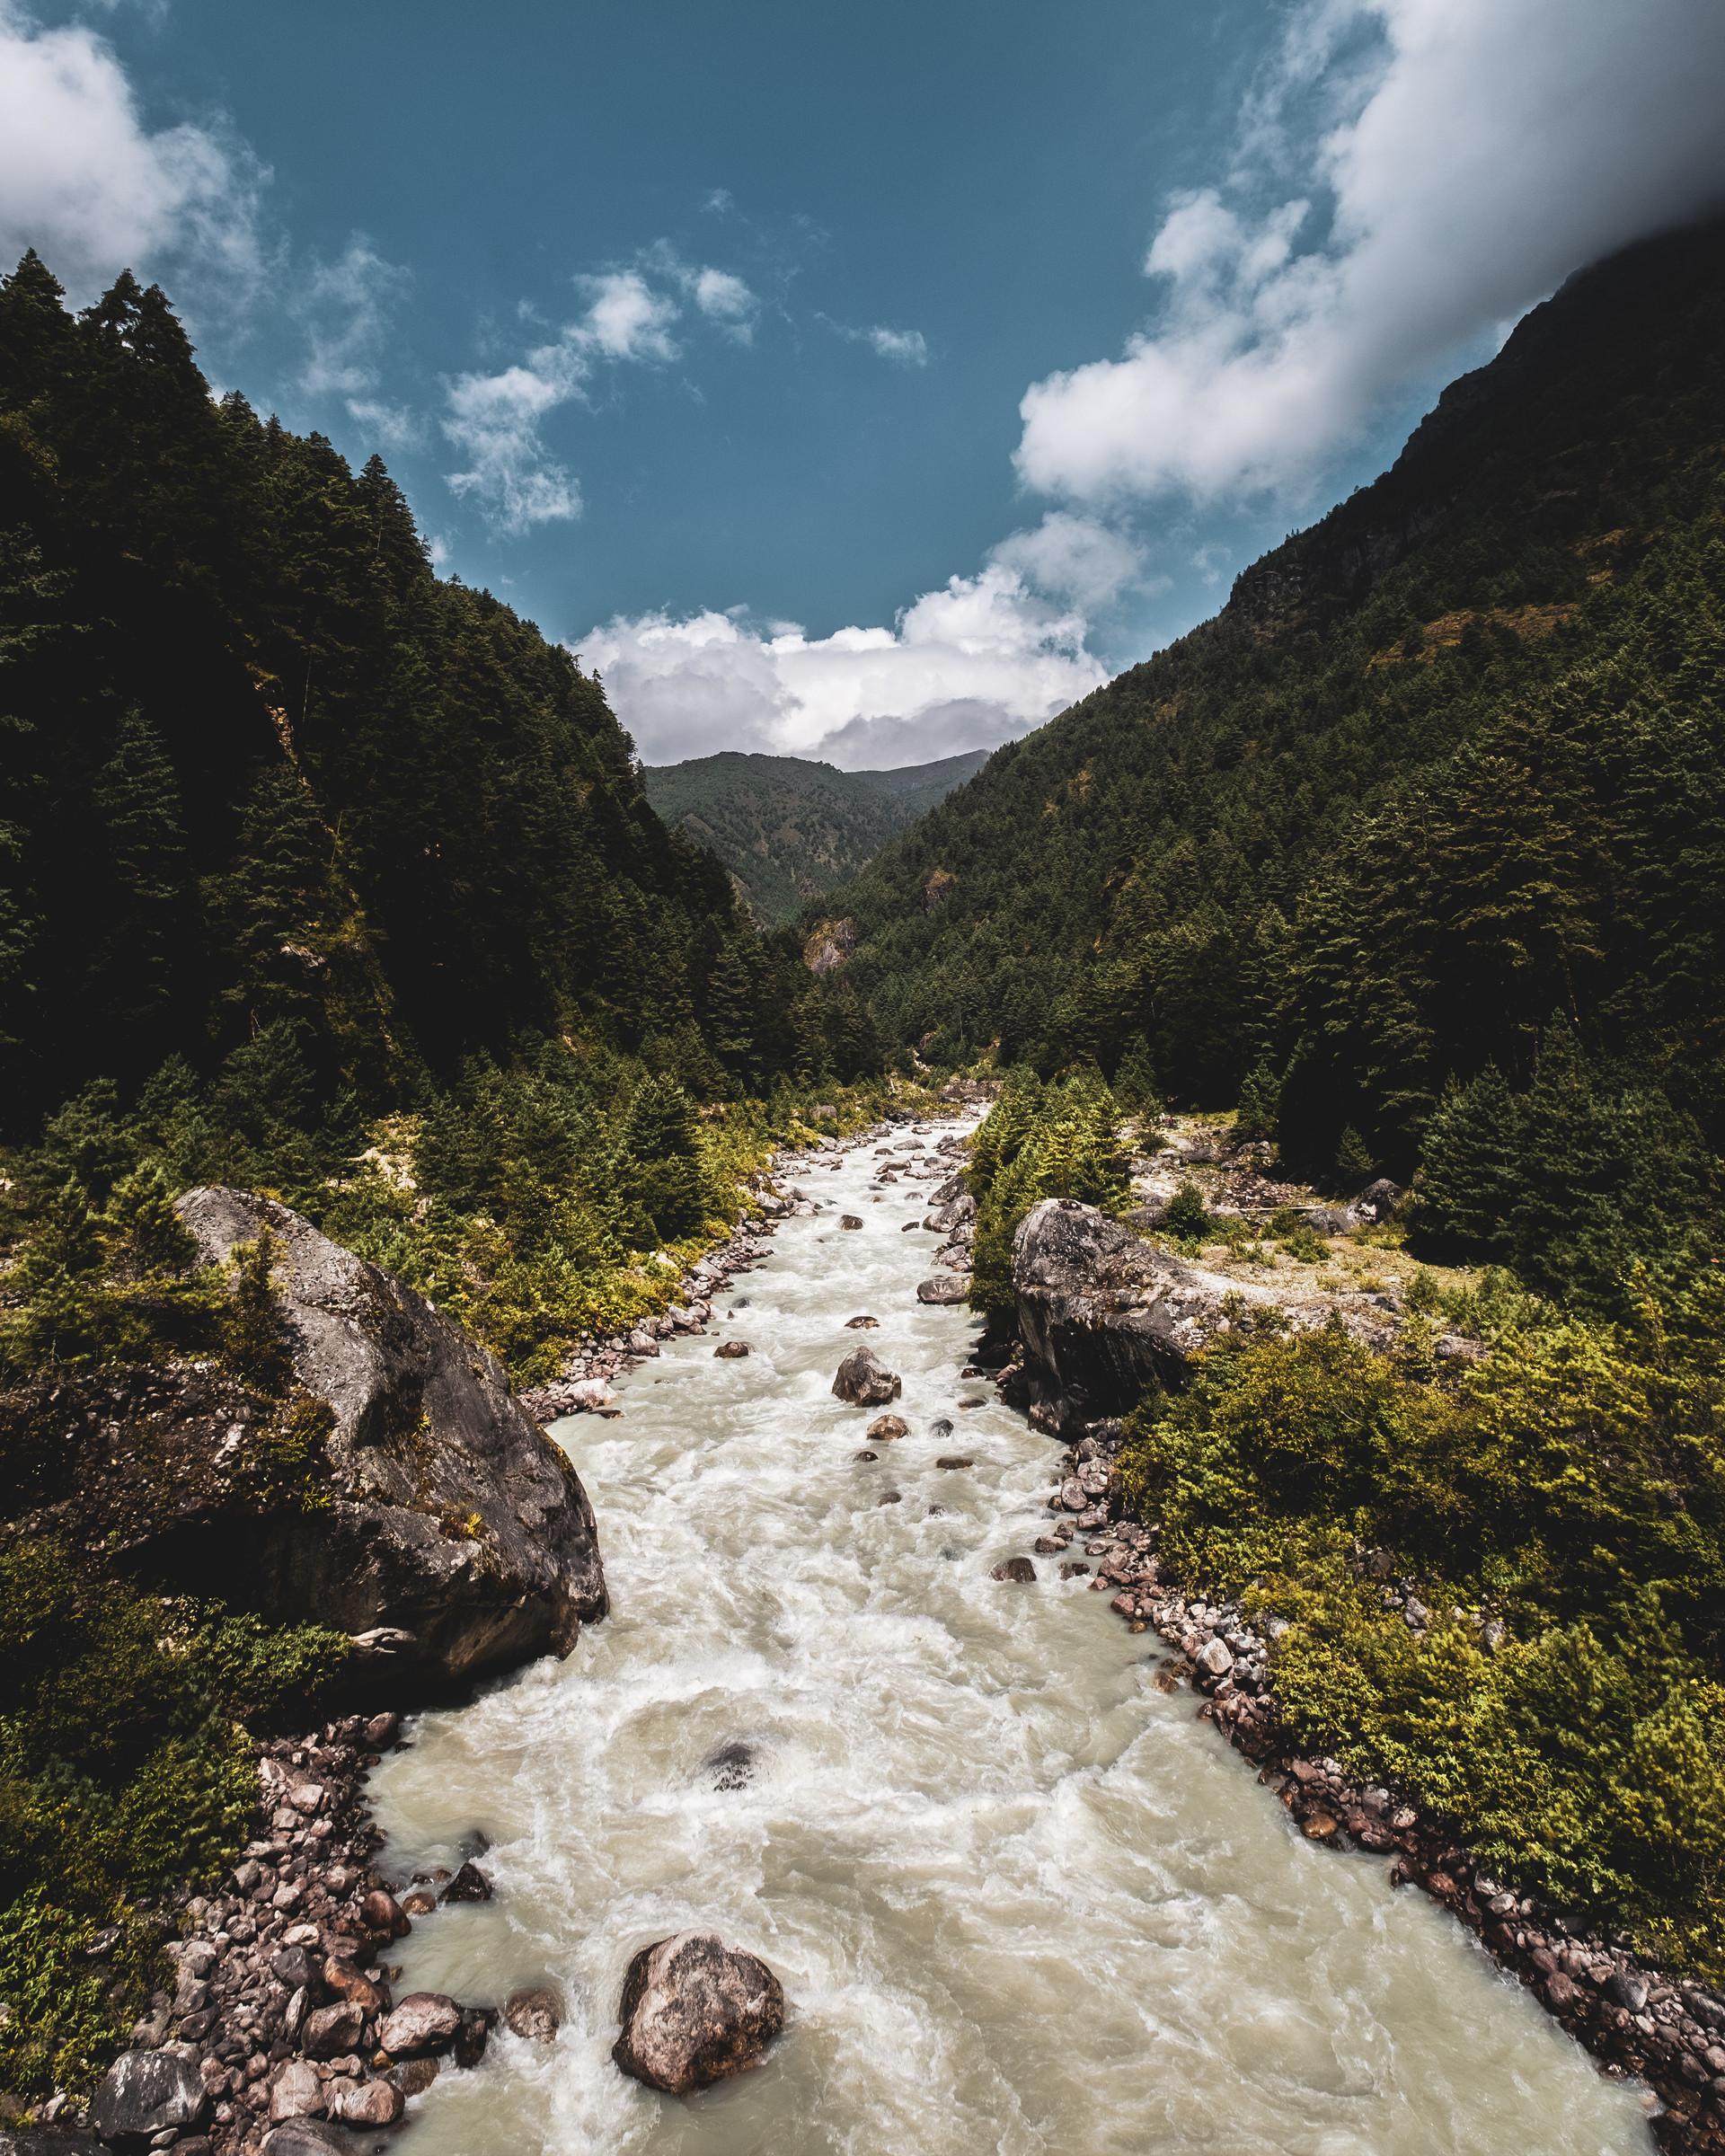 nepal_port-119728.jpg